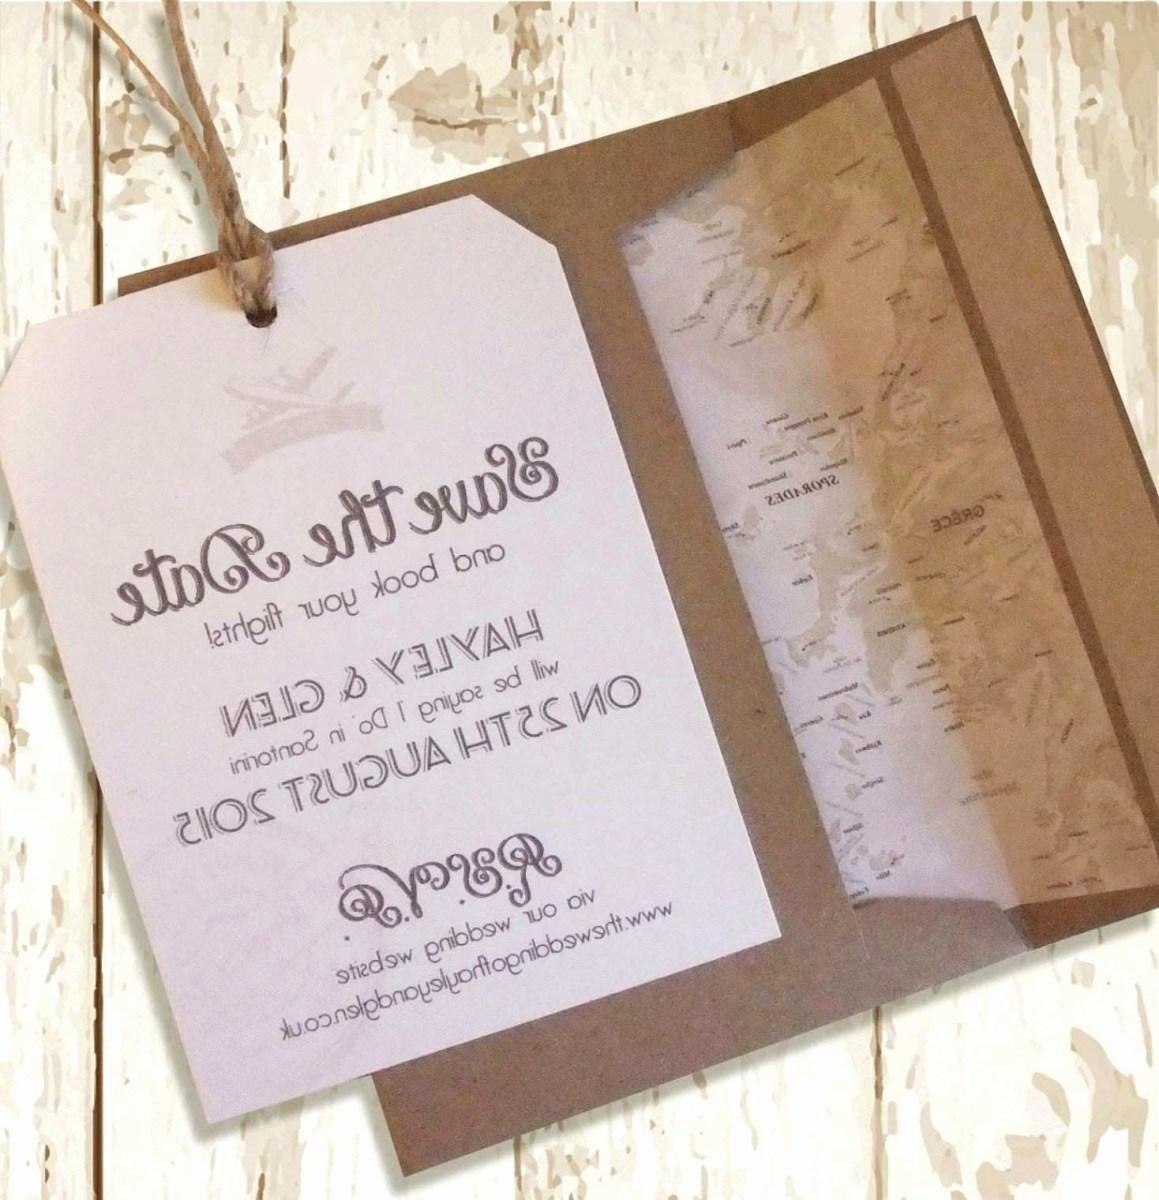 Wedding Reception Invitation Quotes Wedding Initation Wording Nouveau Post Wedding Reception Invitation